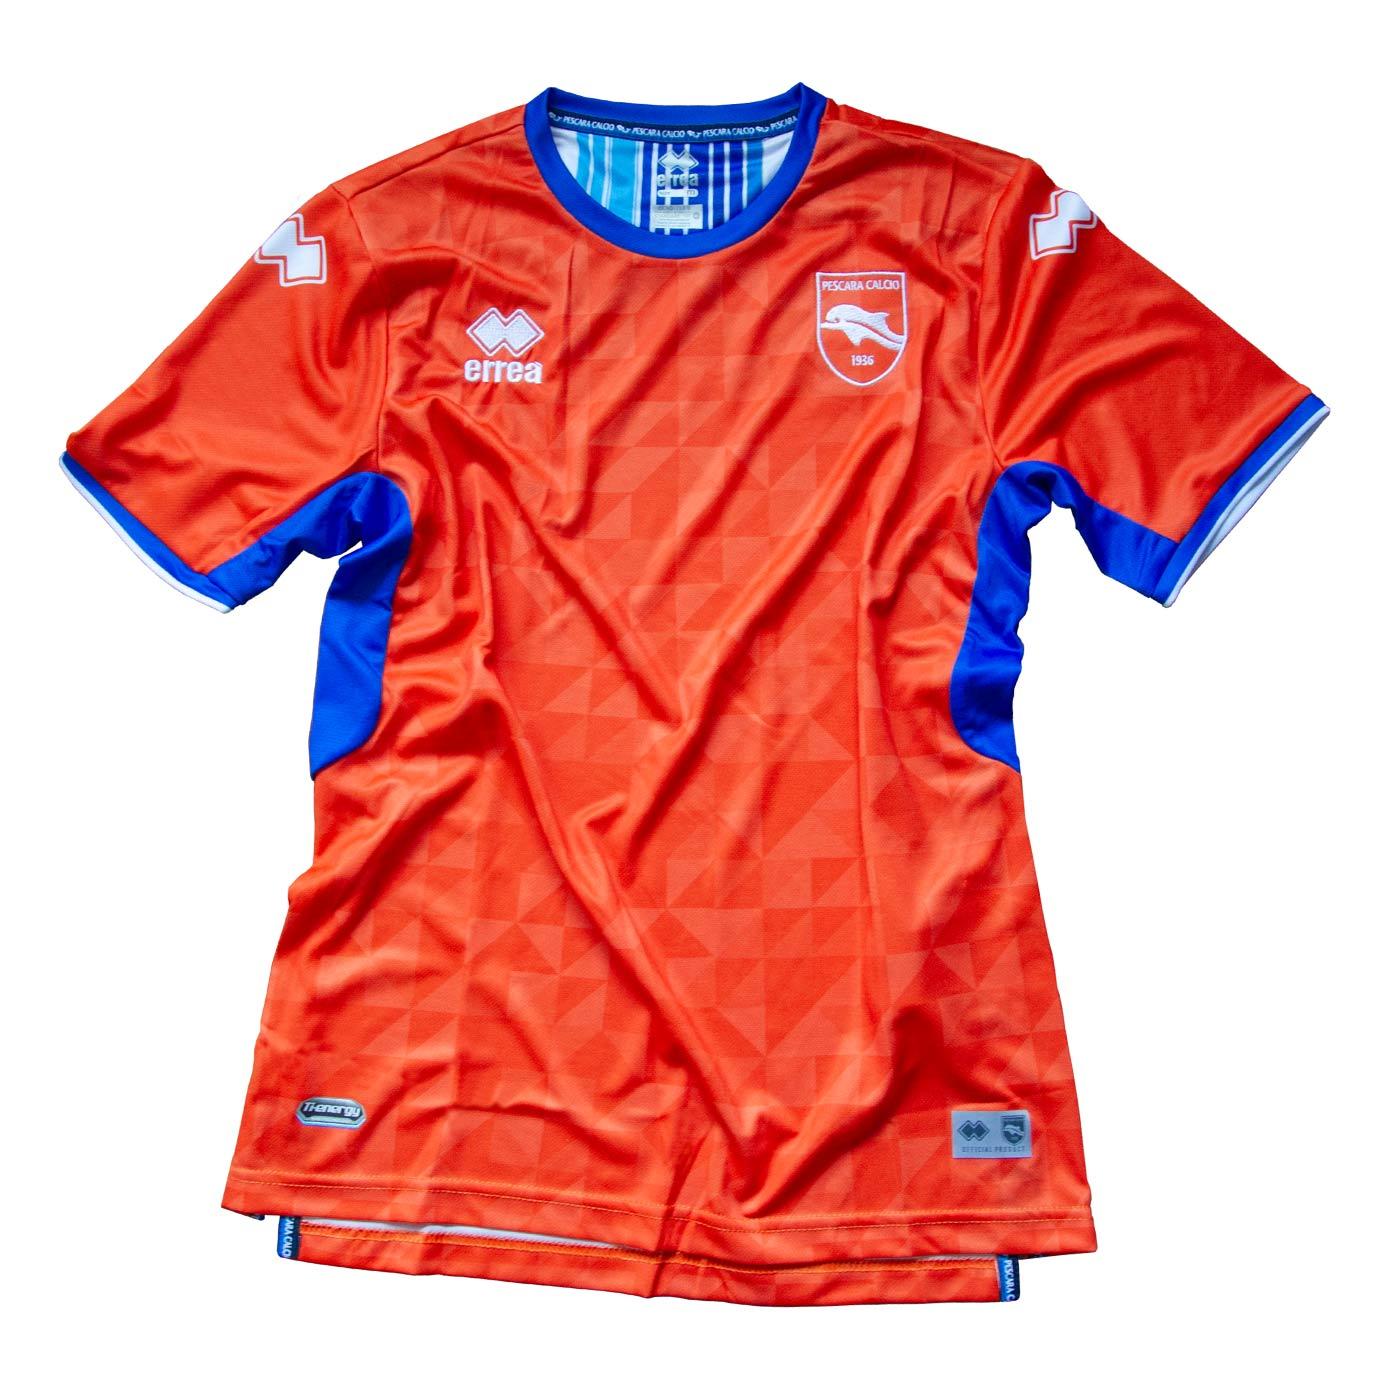 Seconda maglia Pescara 2021-2022 arancione